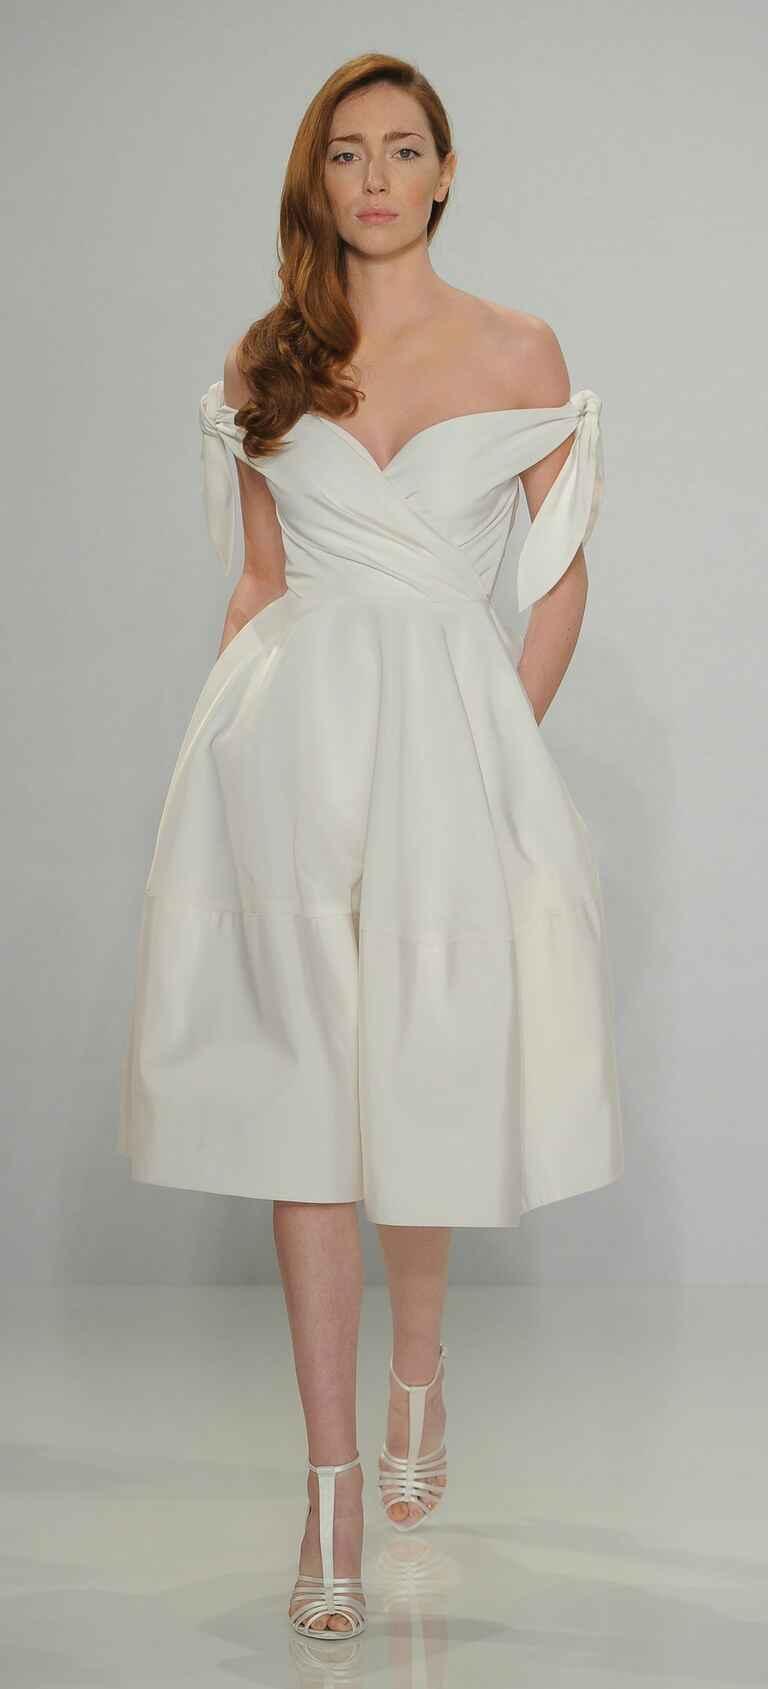 Beach wedding dresses a complete guide for Valentino short wedding dress